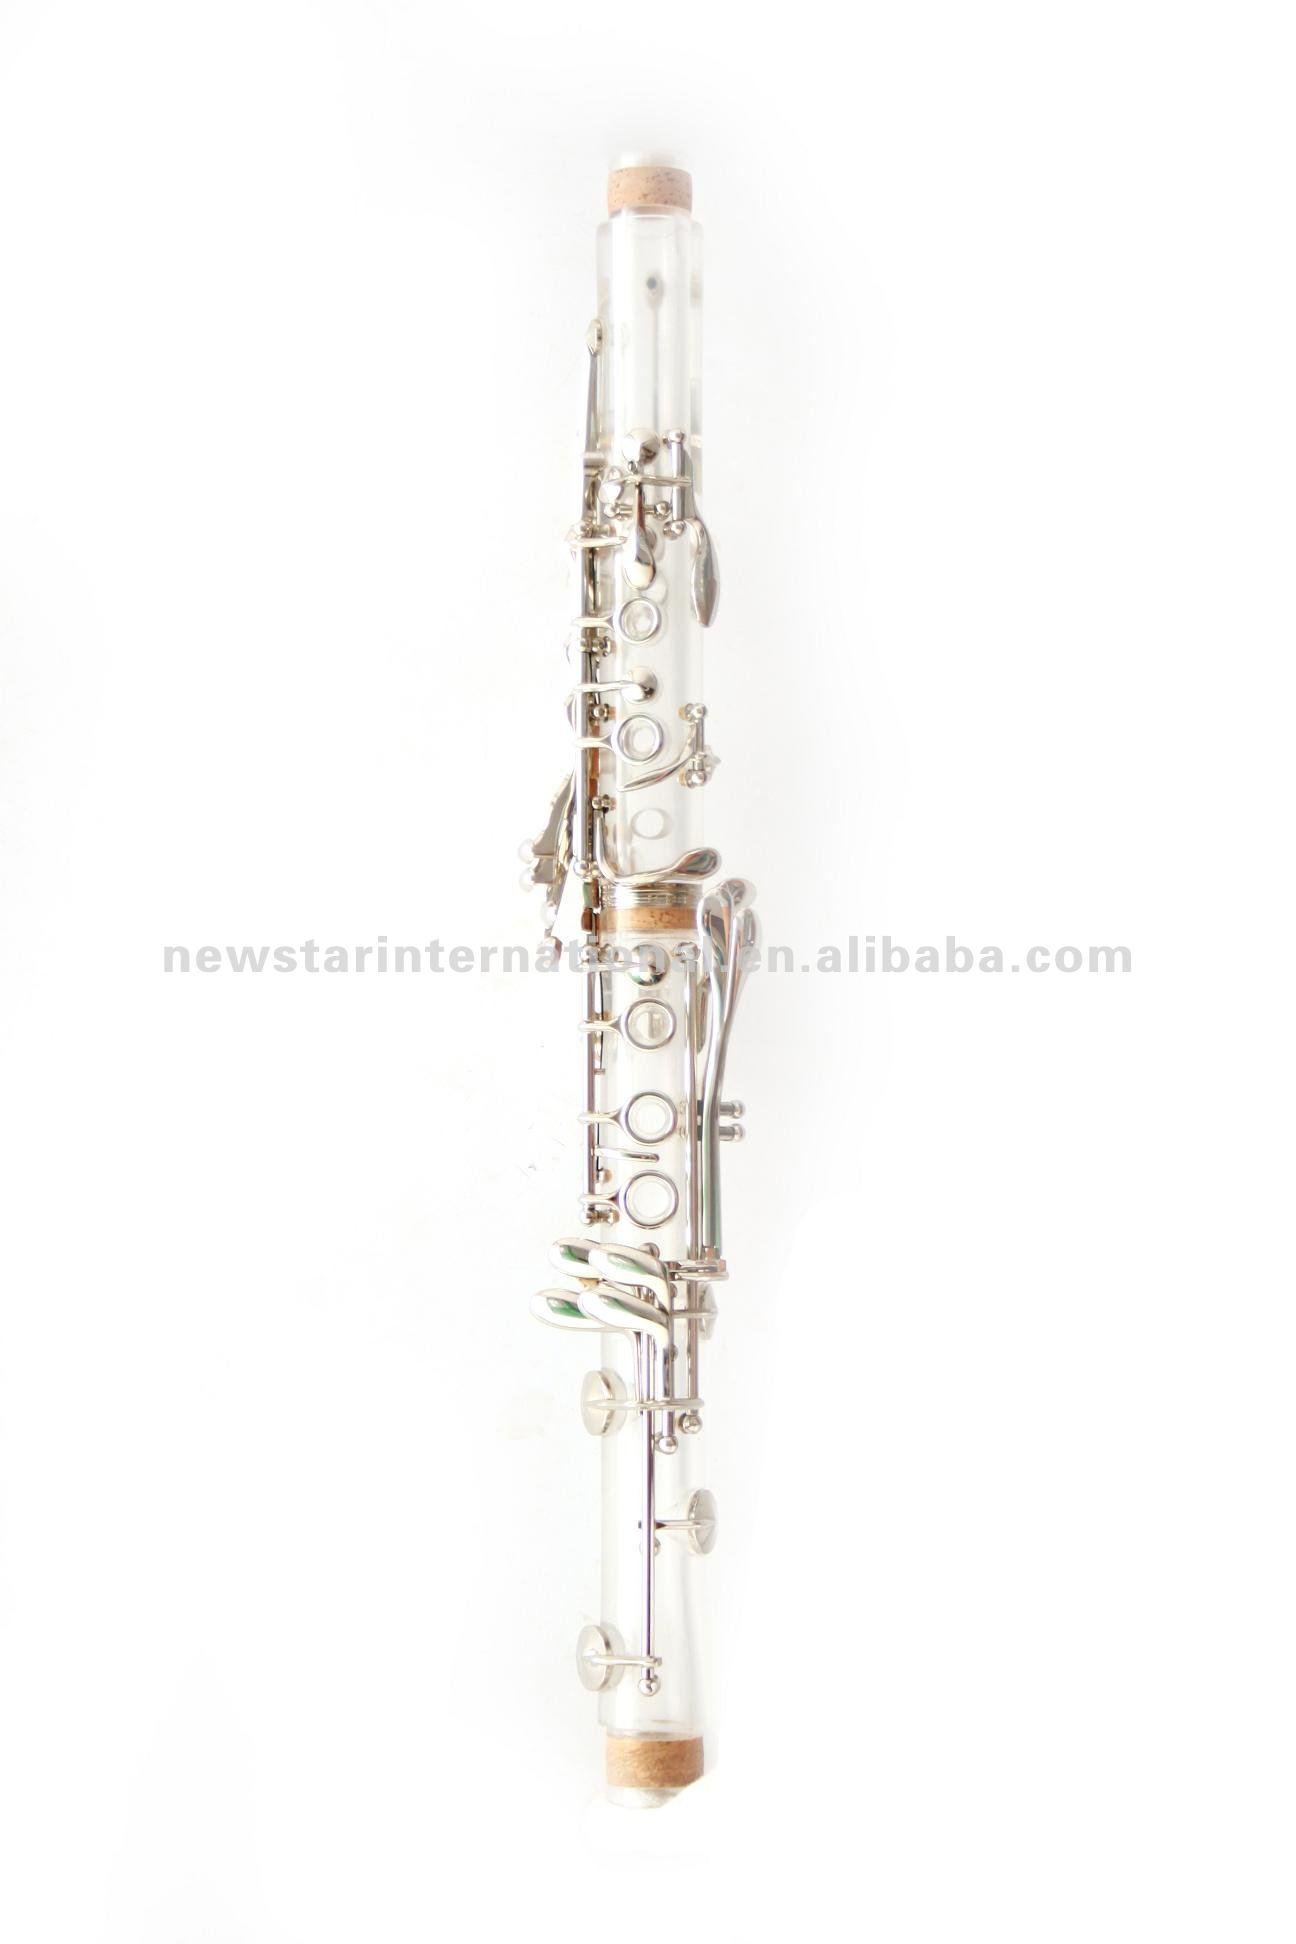 Amber/transparente clarinete ( hcl - 307 )